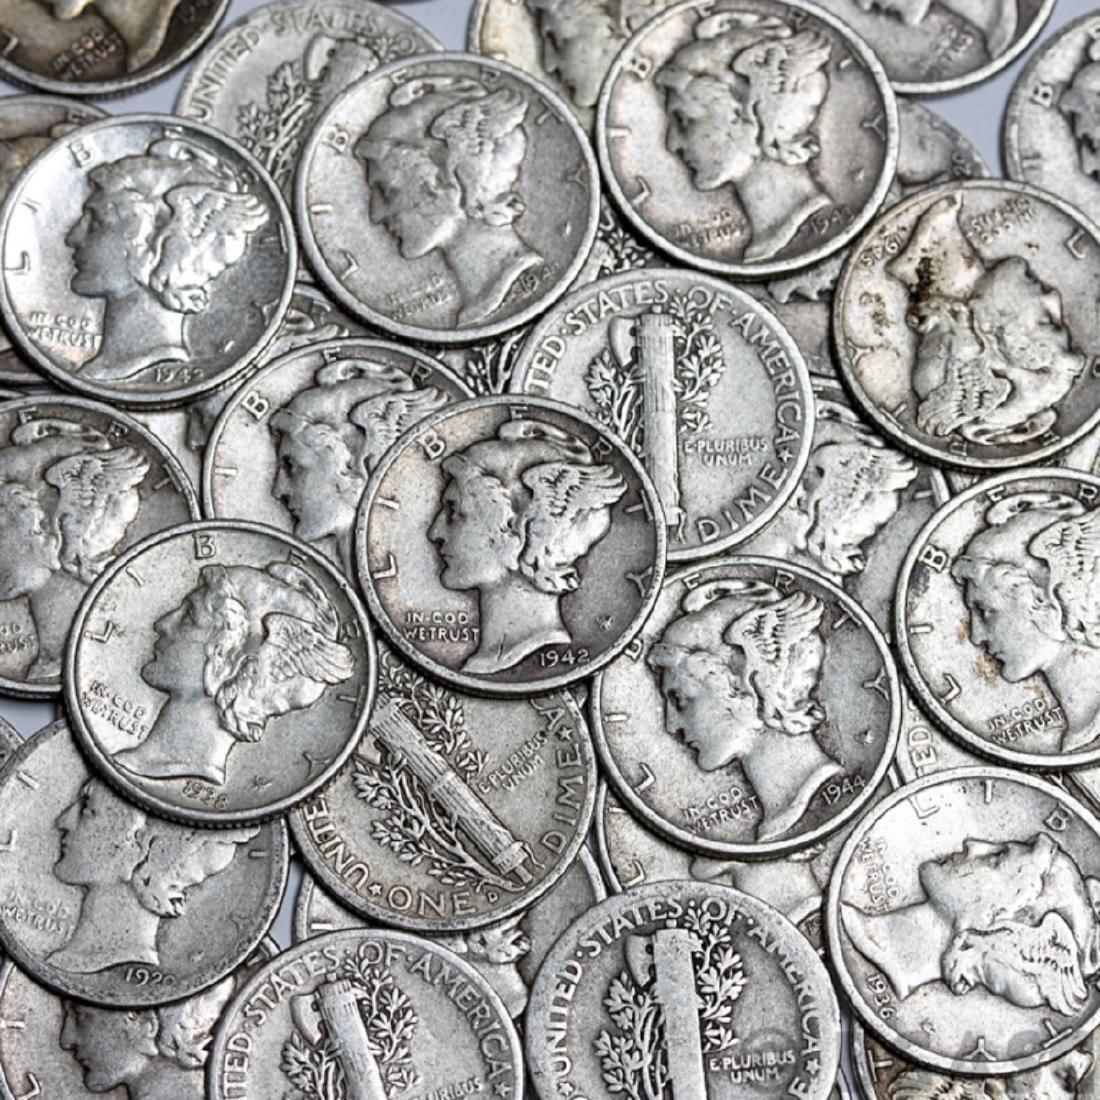 Lot of (100) Mercury Dimes -90% Silver - 2